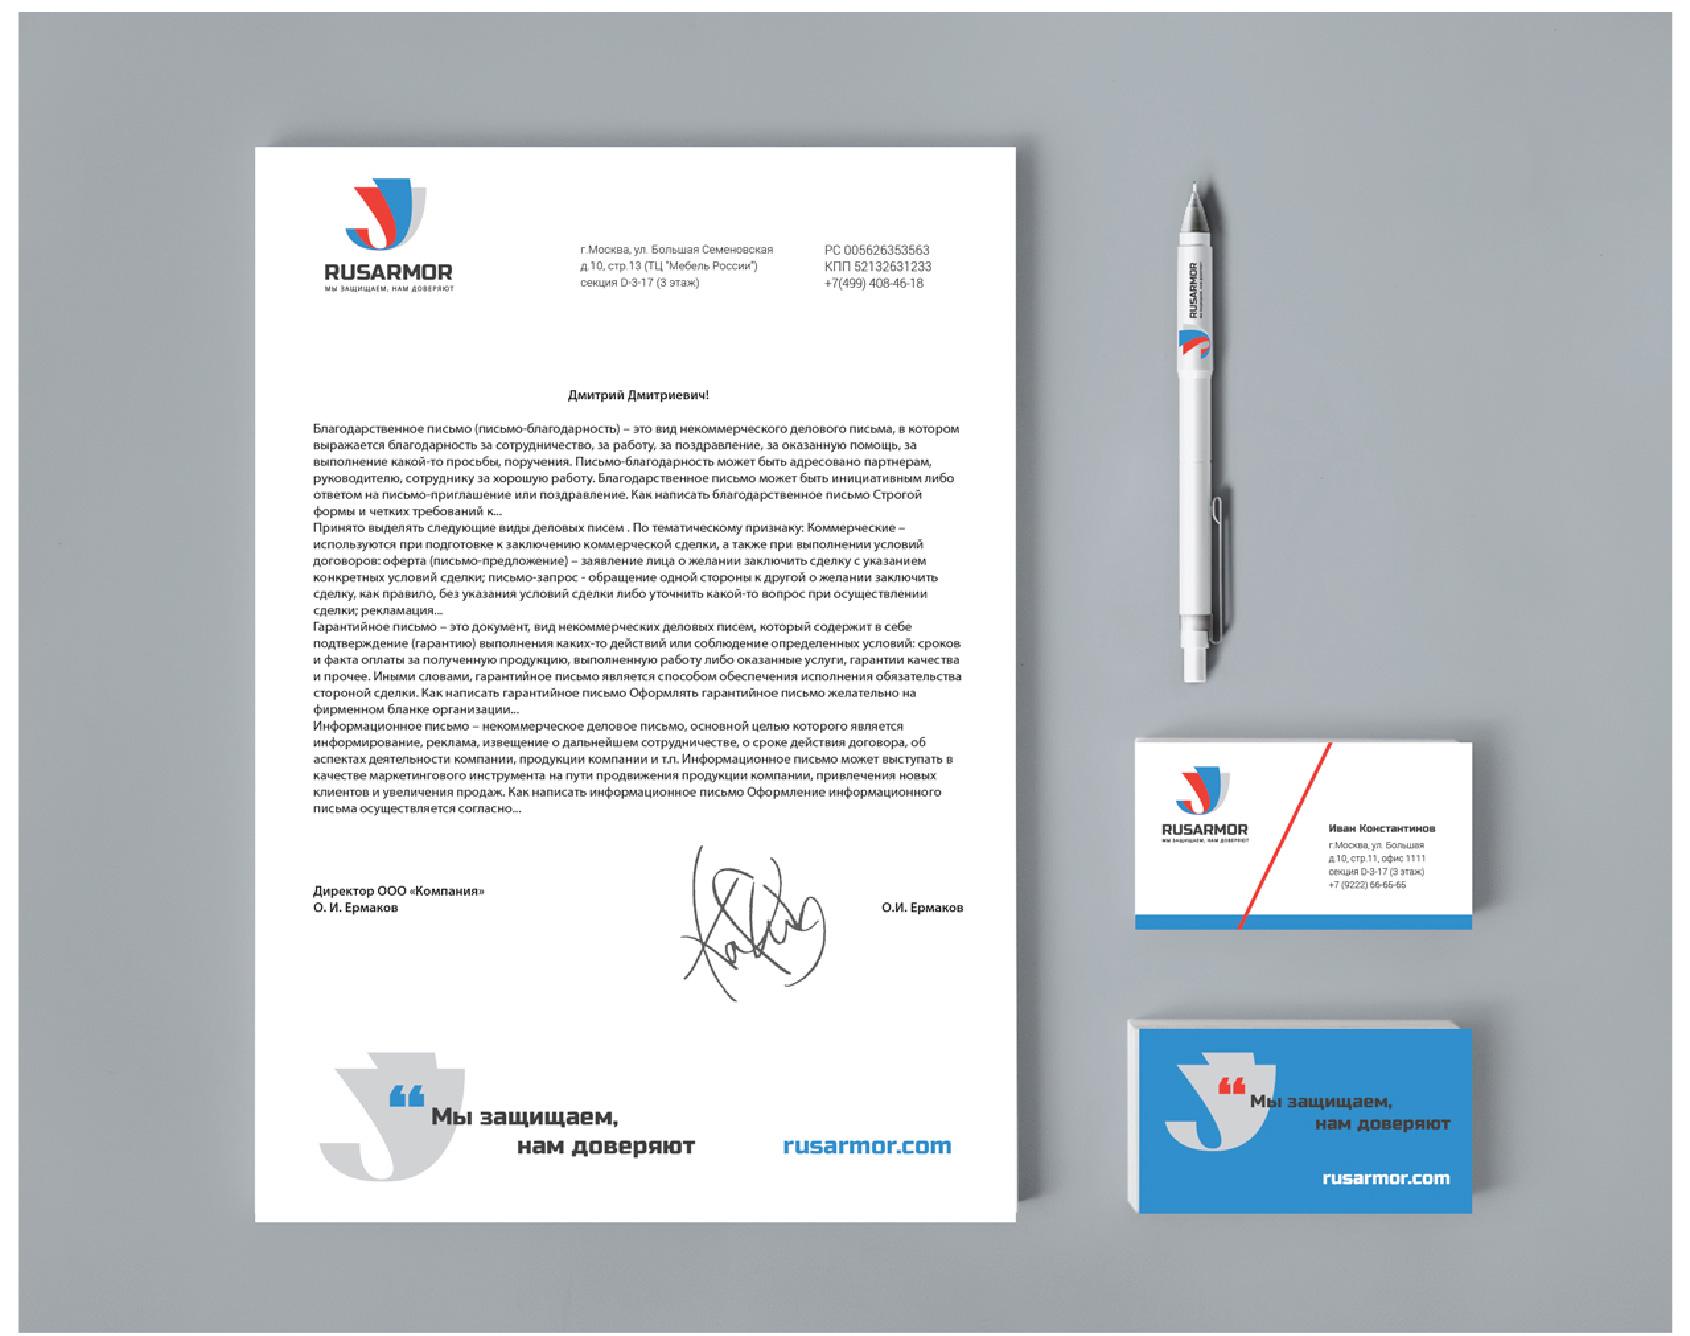 Разработка логотипа технологического стартапа РУСАРМОР фото f_7415a0acc3d6efc6.jpg